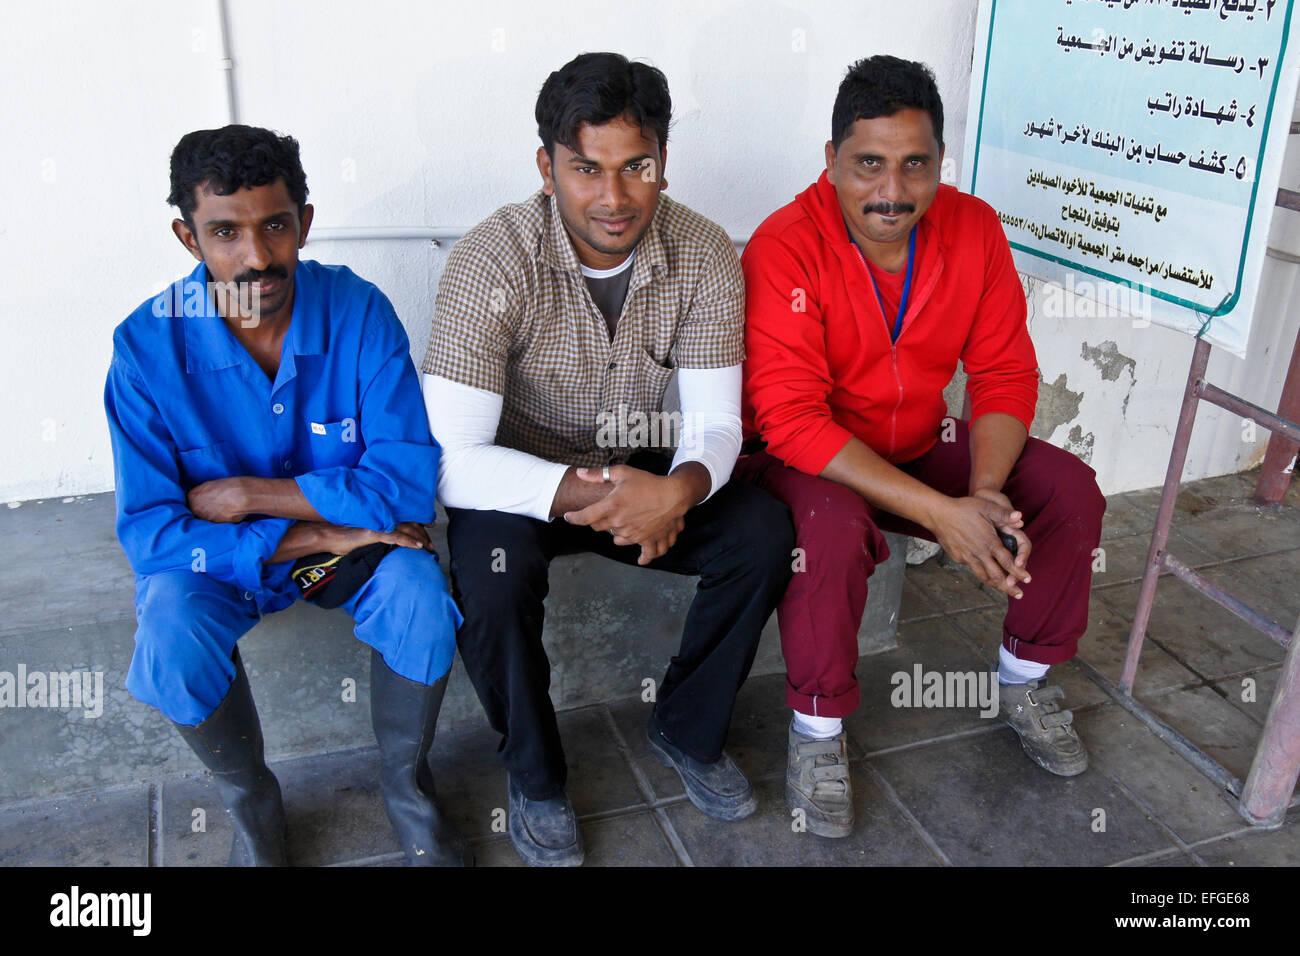 Immigrant workers (from Bangladesh) at Dibba Muhallab fish market, Fujairah, United Arab Emirates - Stock Image